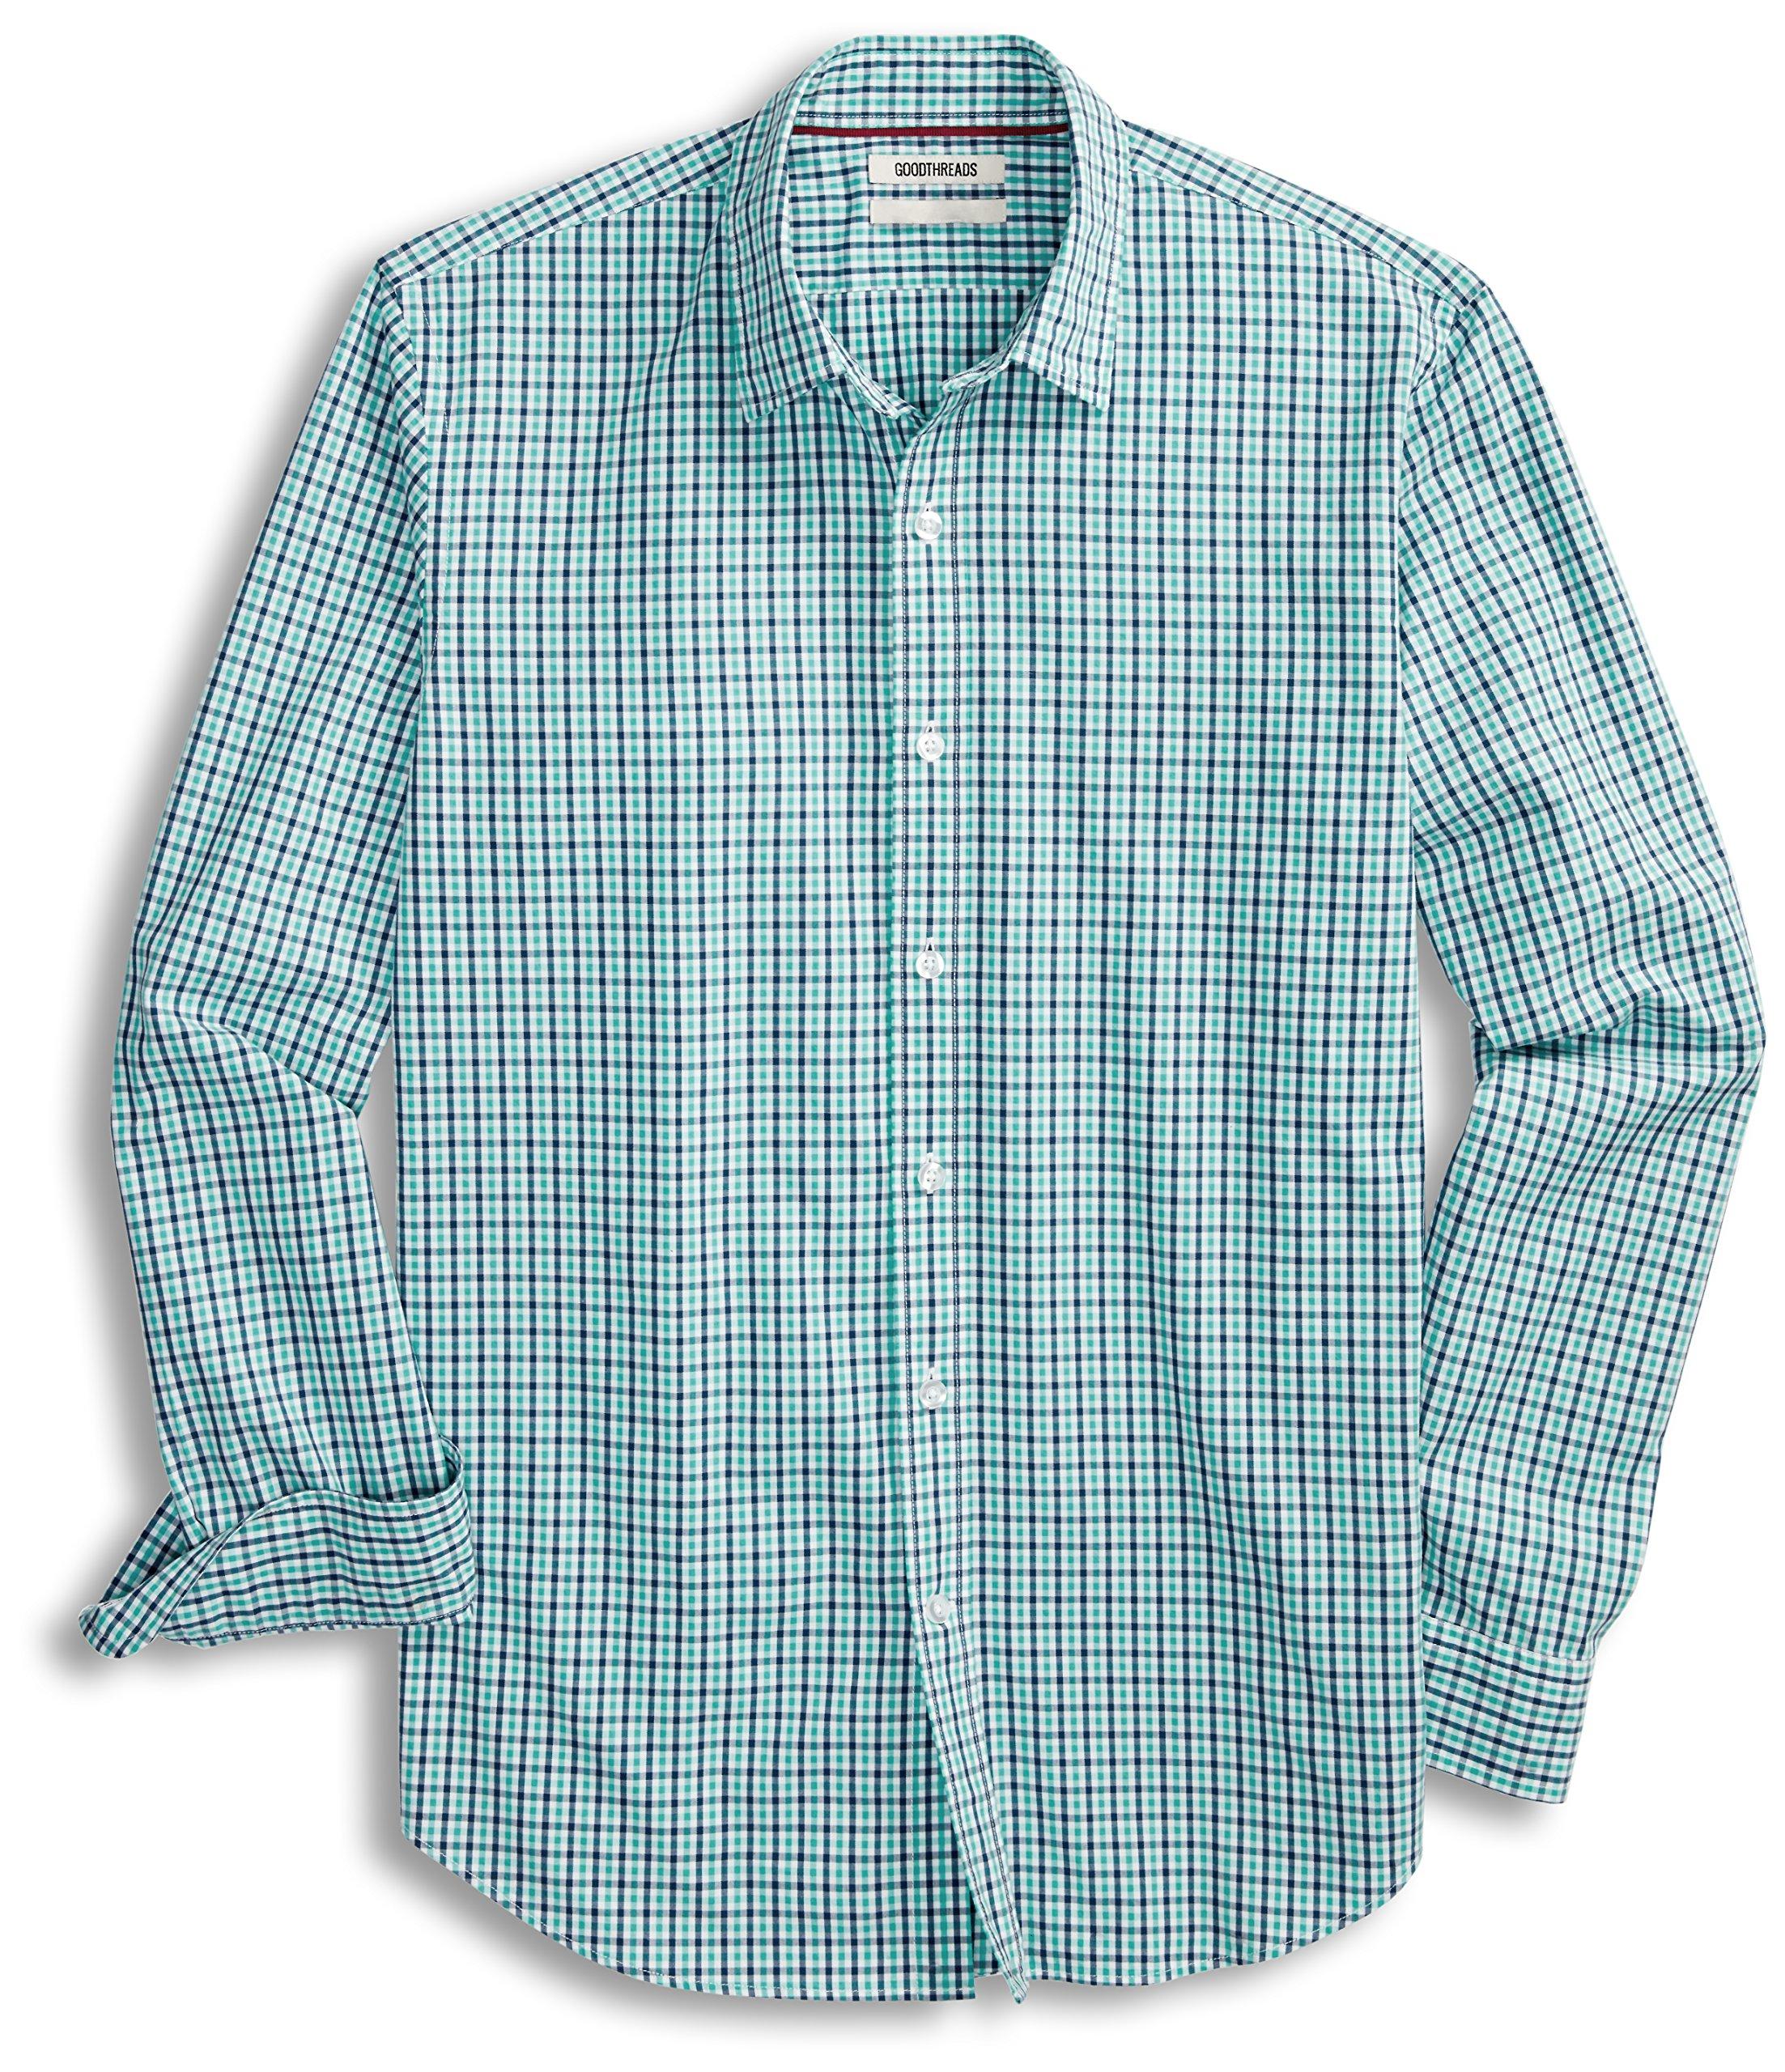 Goodthreads Men's Standard-Fit Long-Sleeve Gingham Plaid Poplin Shirt, Blue/Aqua, X-Large